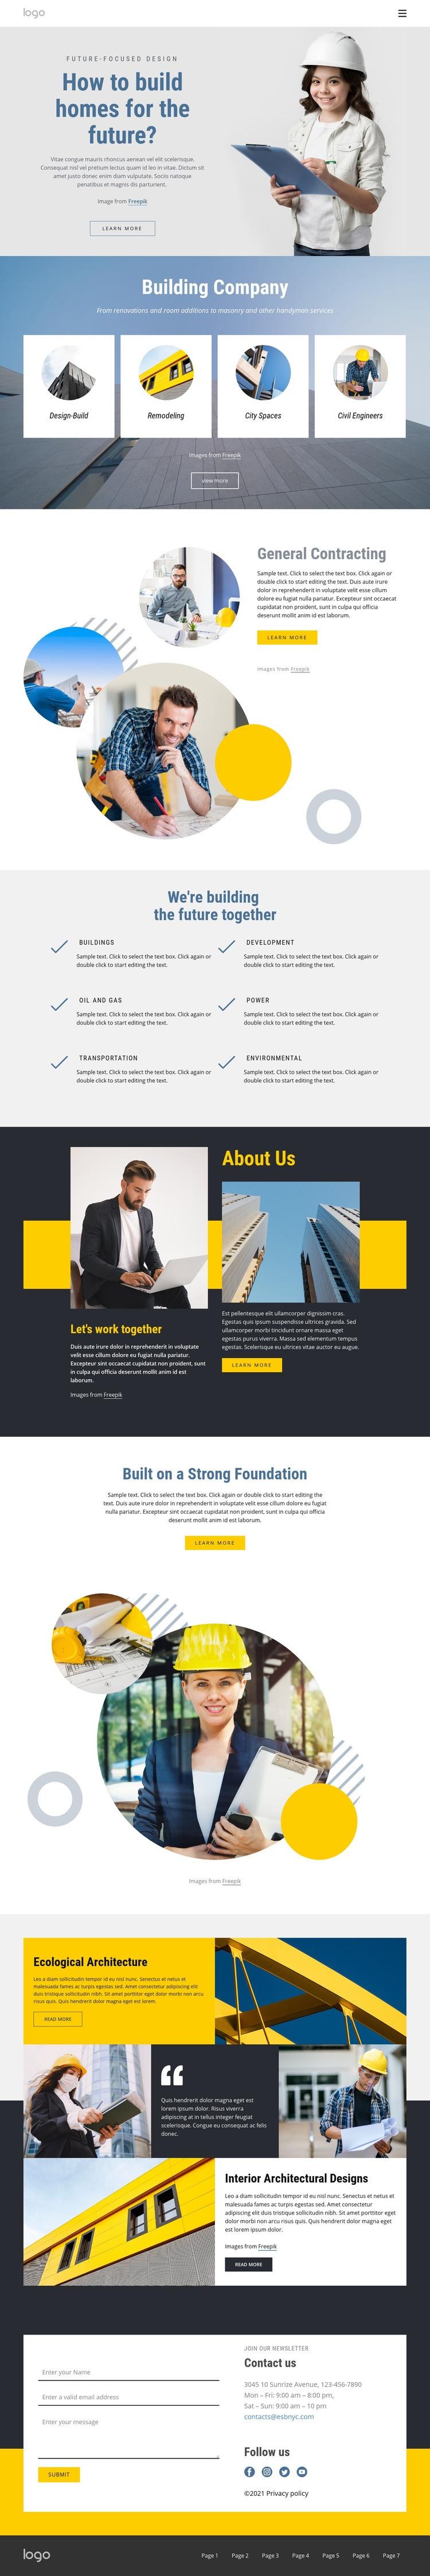 General contracting company Web Page Designer